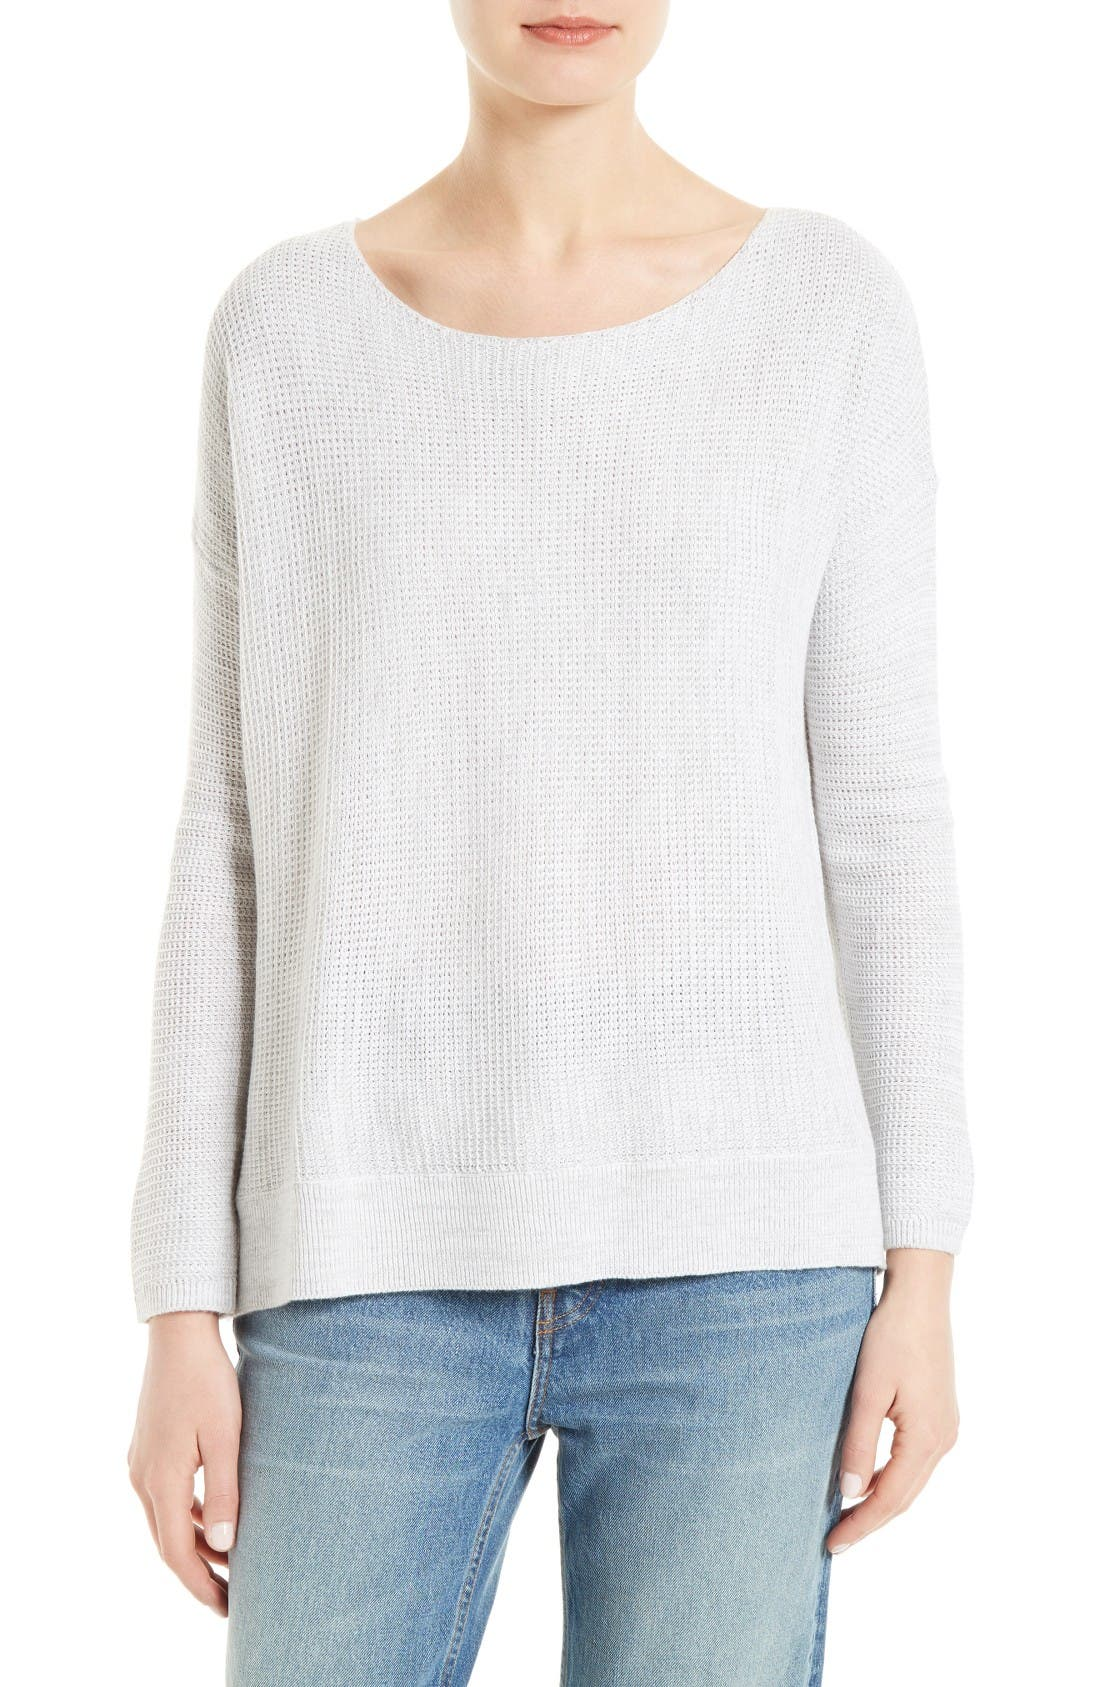 Soft Joie Kashani Pullover,                         Main,                         color, Porcelain/ Heather Grey